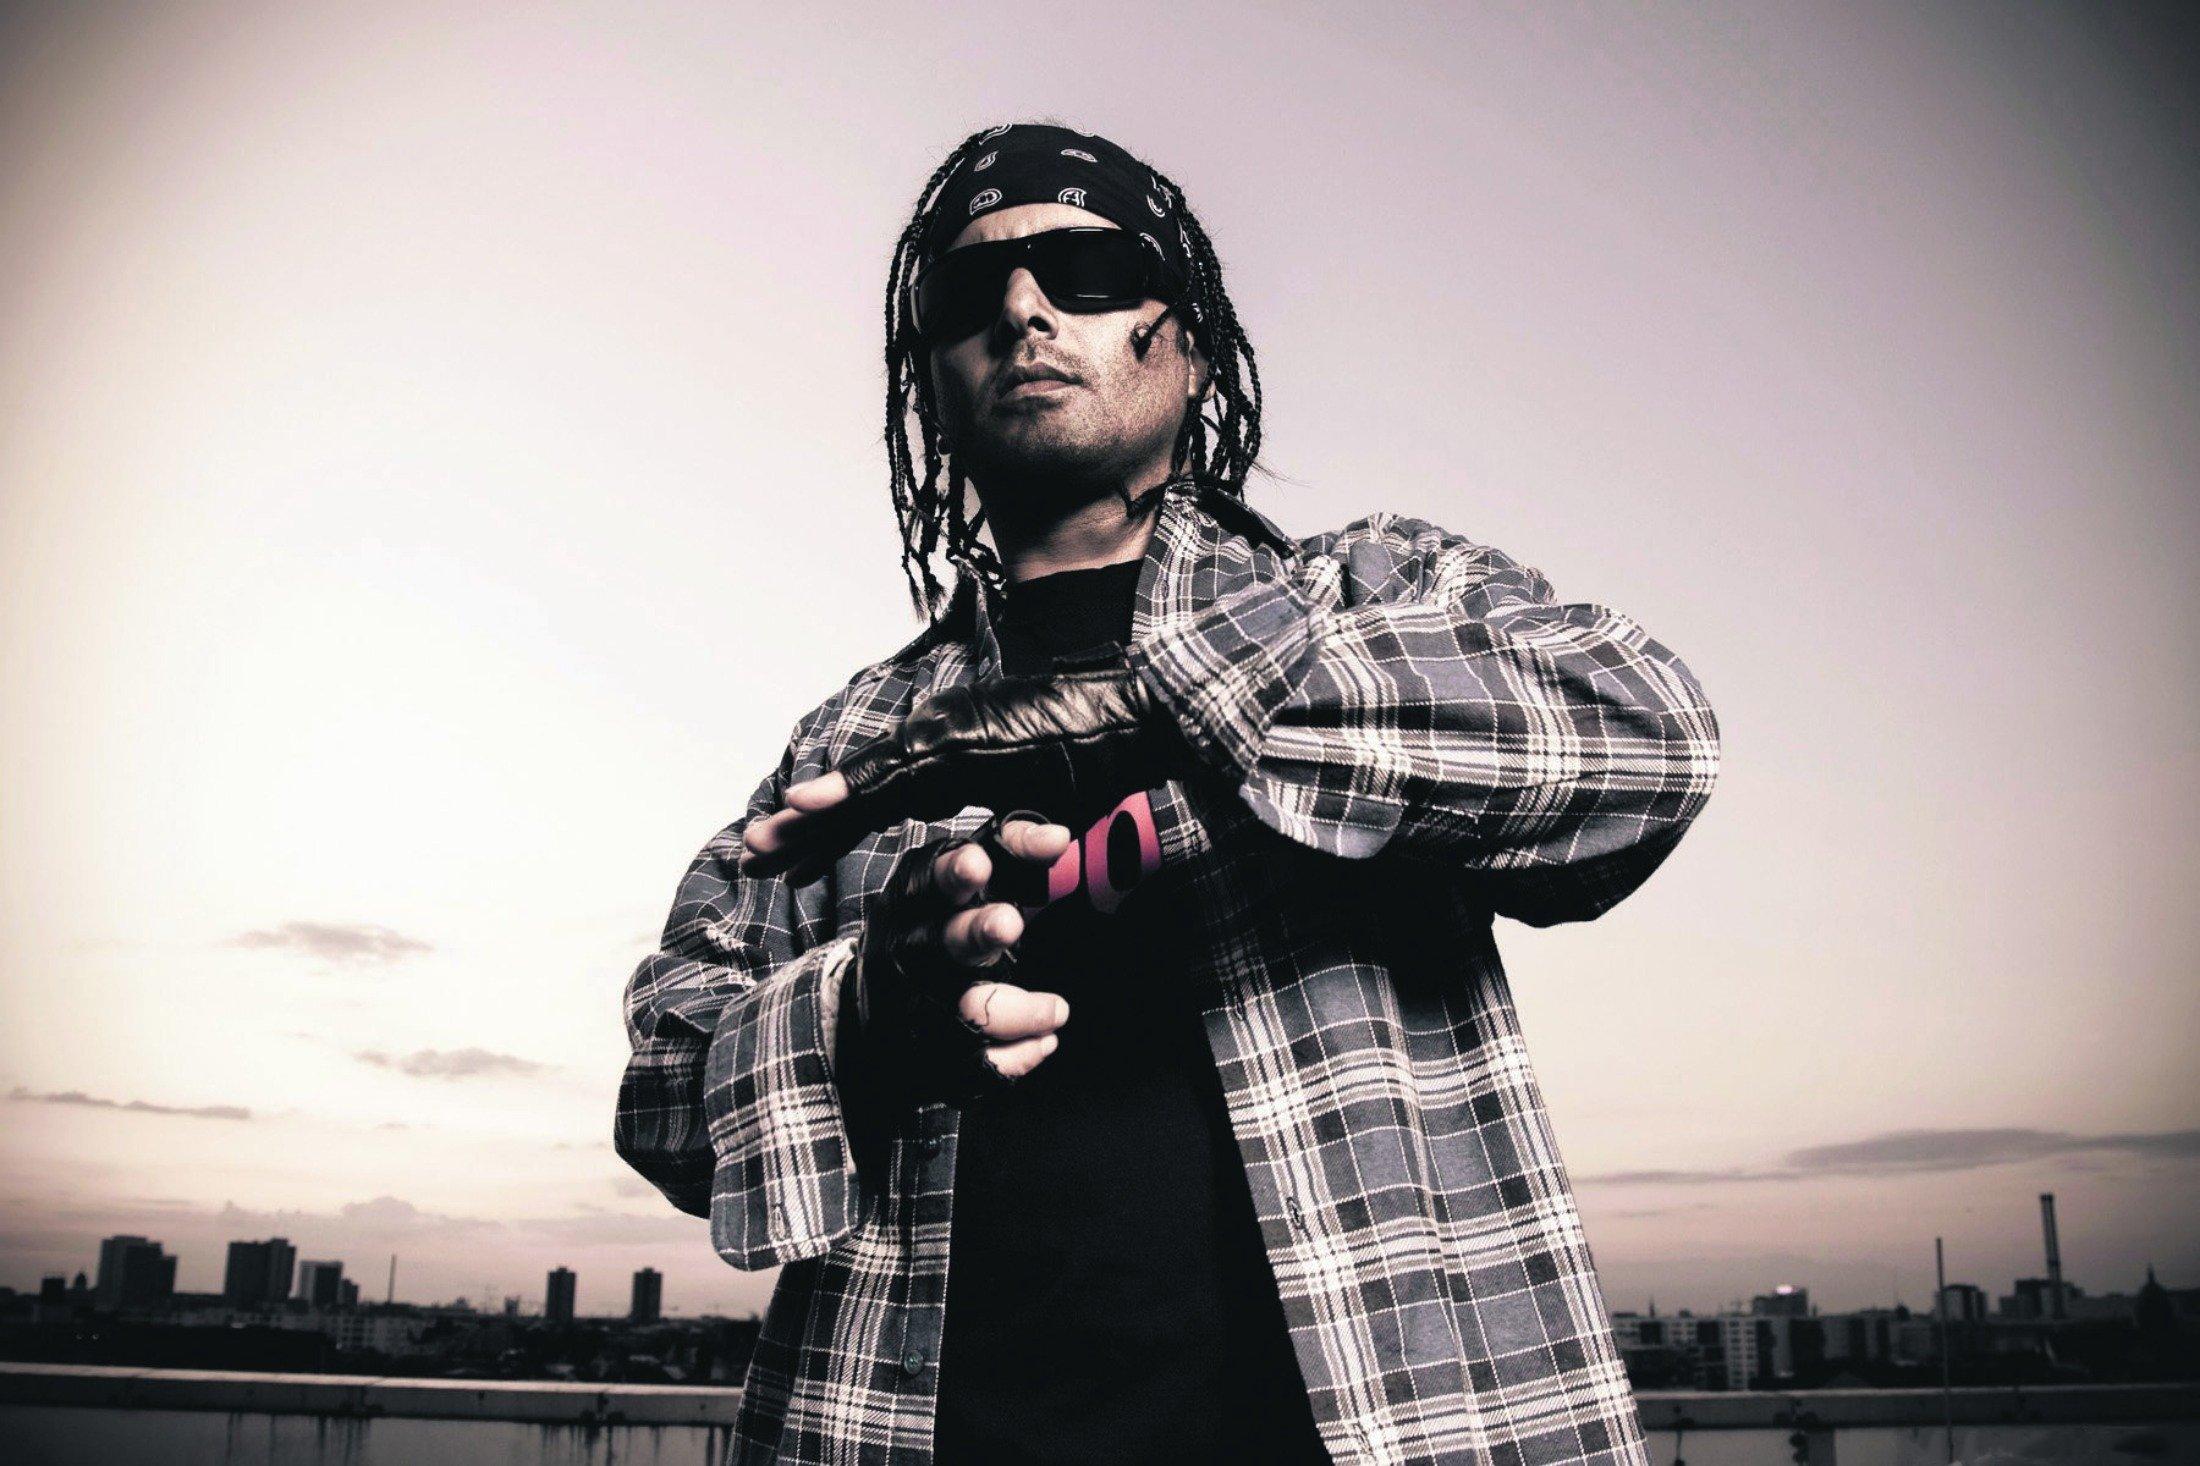 Turkish rapper Killa Hakan poses for the cover of his new album 'Volume Maximum.' (Archive Photo)